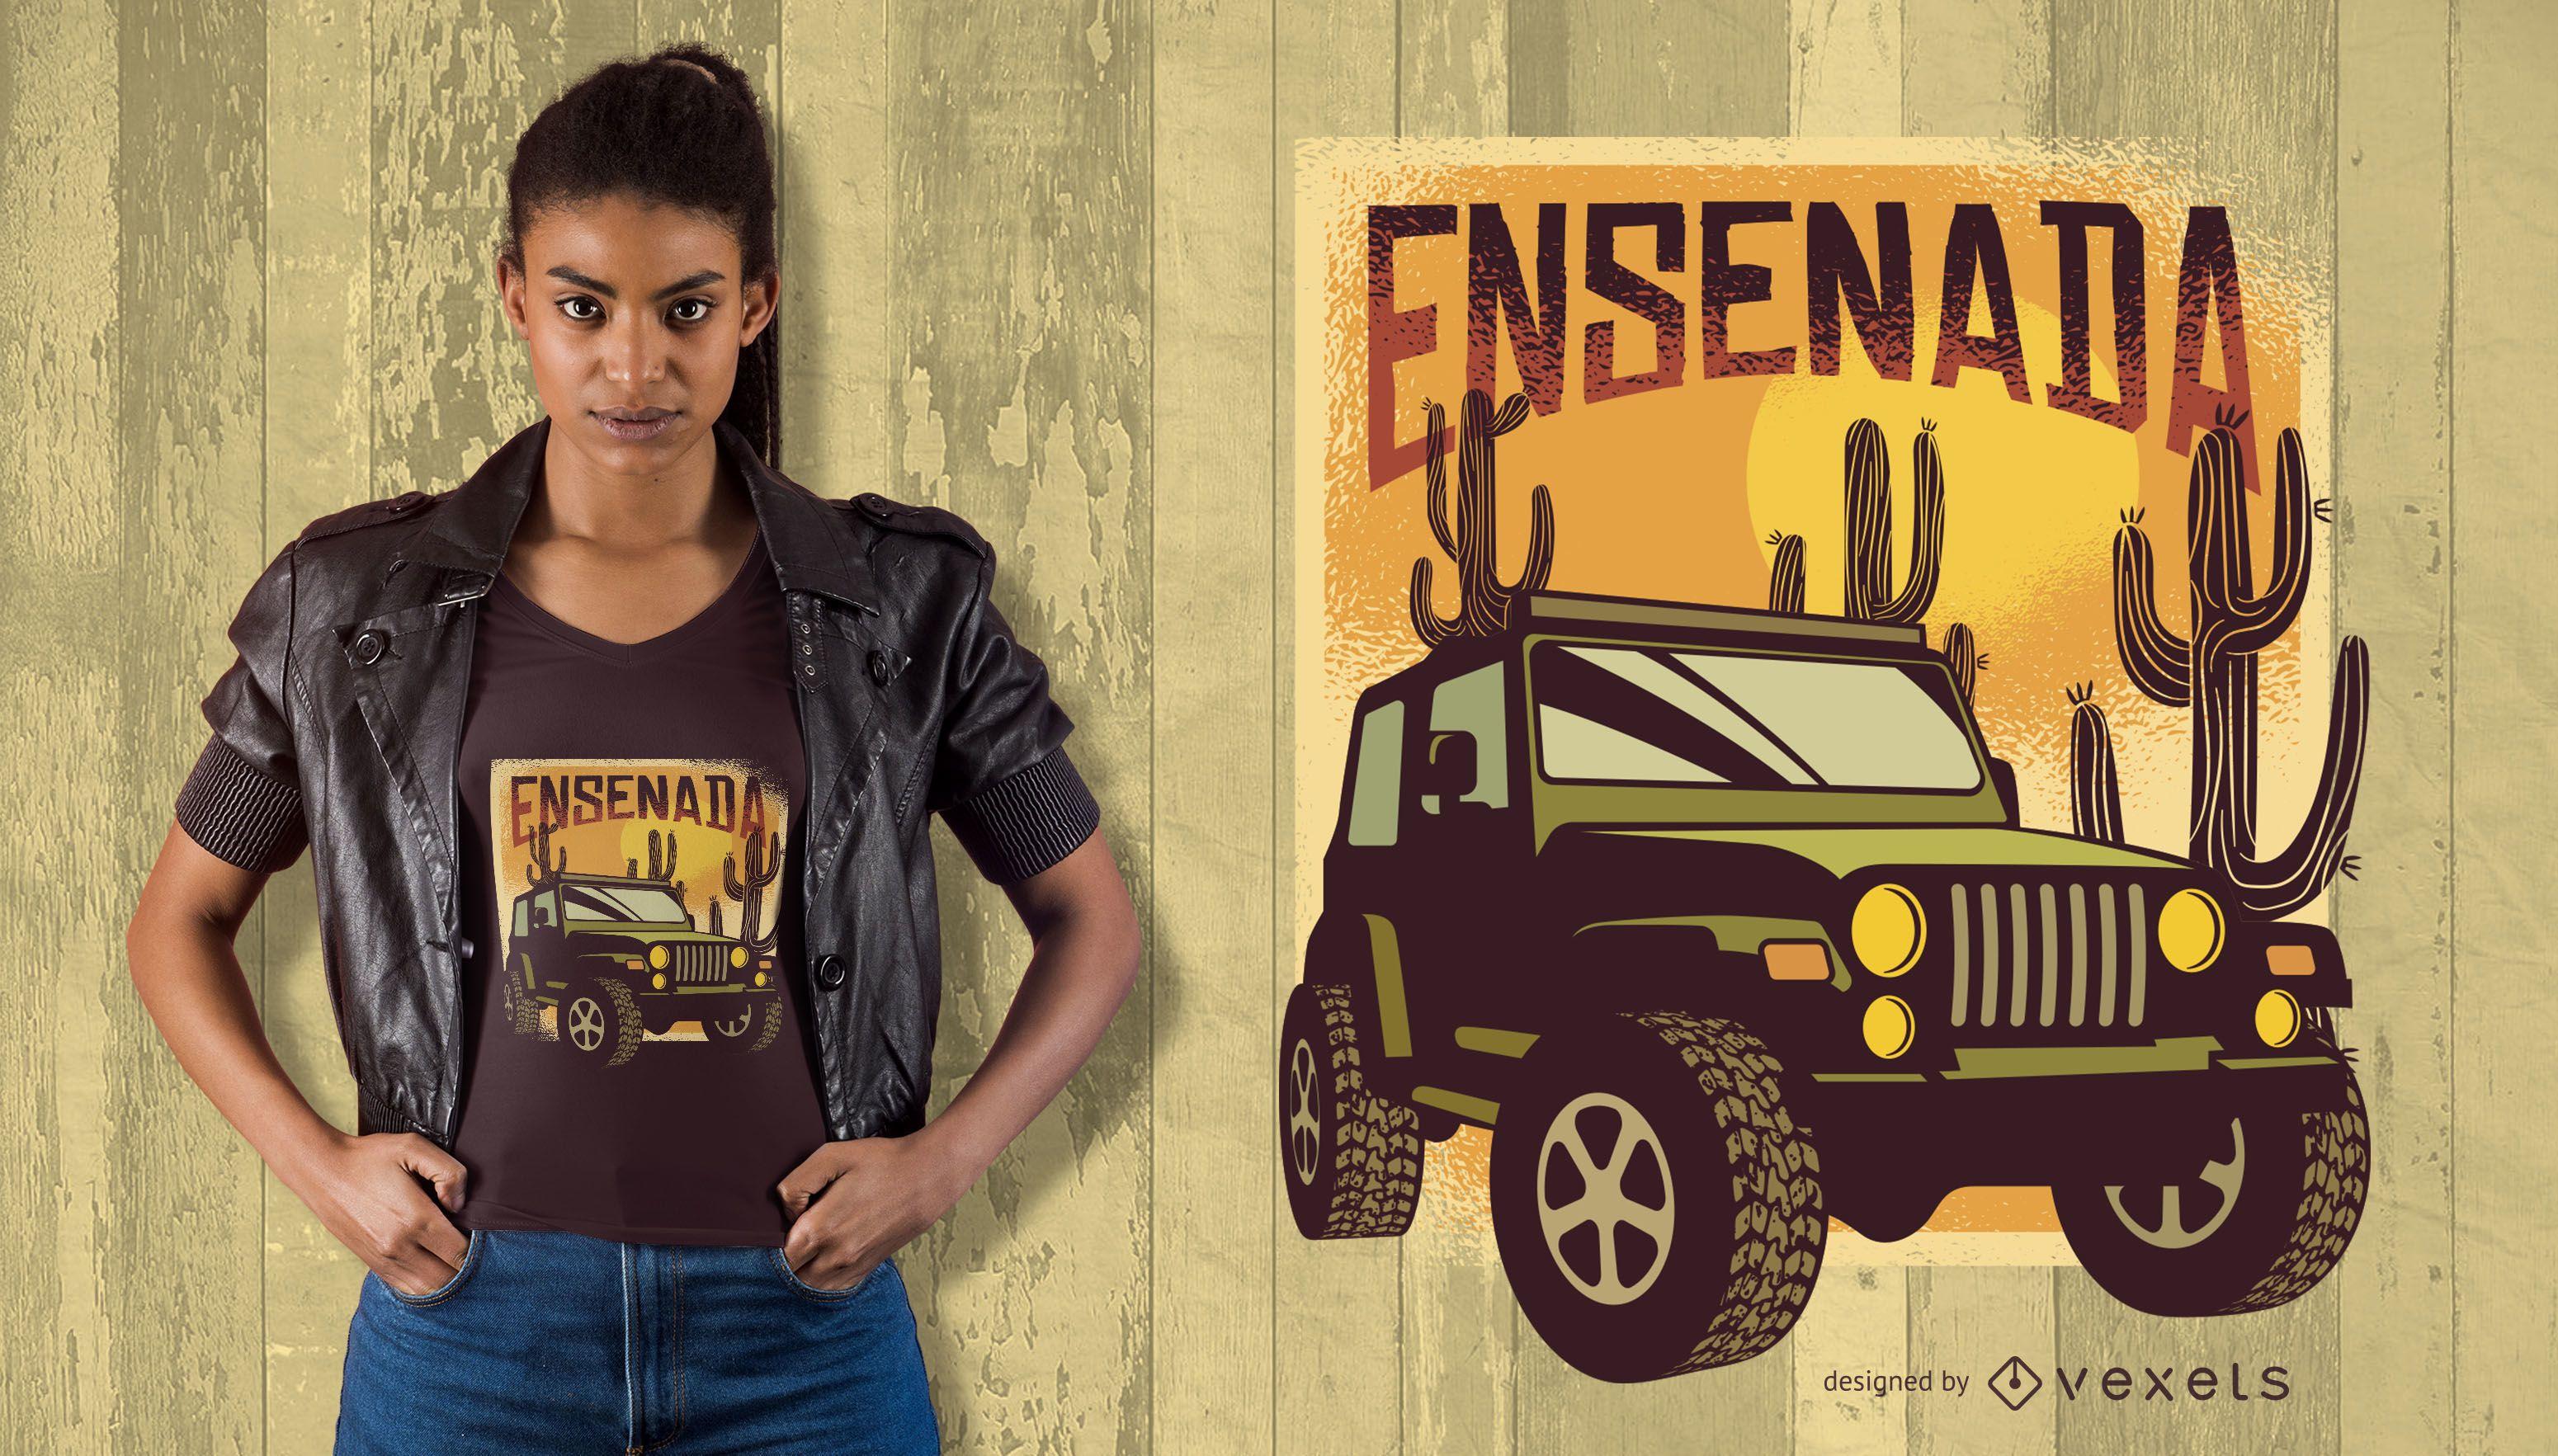 Ensenada T-Shirt Design